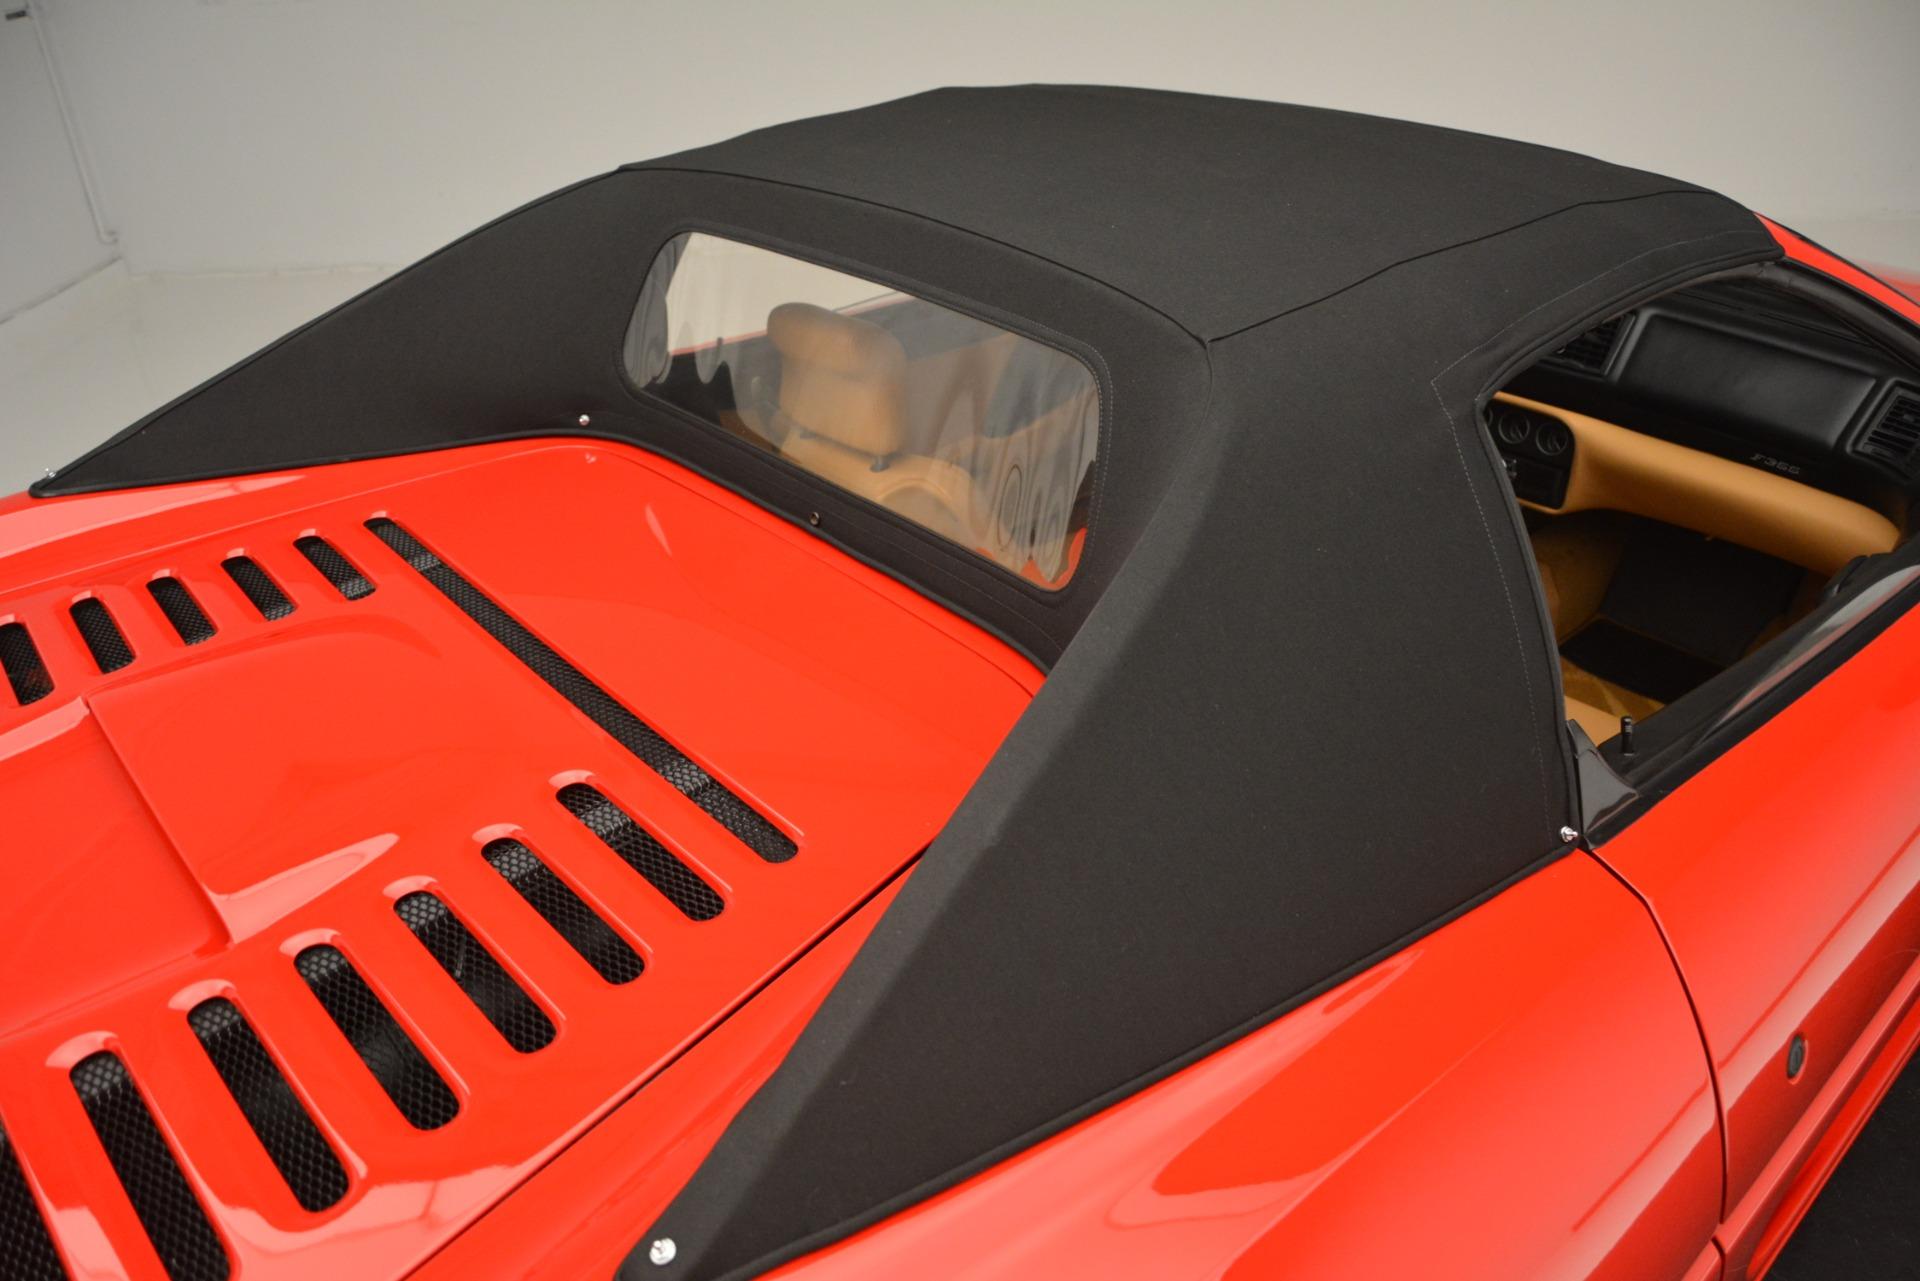 Used 1997 Ferrari 355 Spider 6-Speed Manual For Sale In Westport, CT 2735_p25